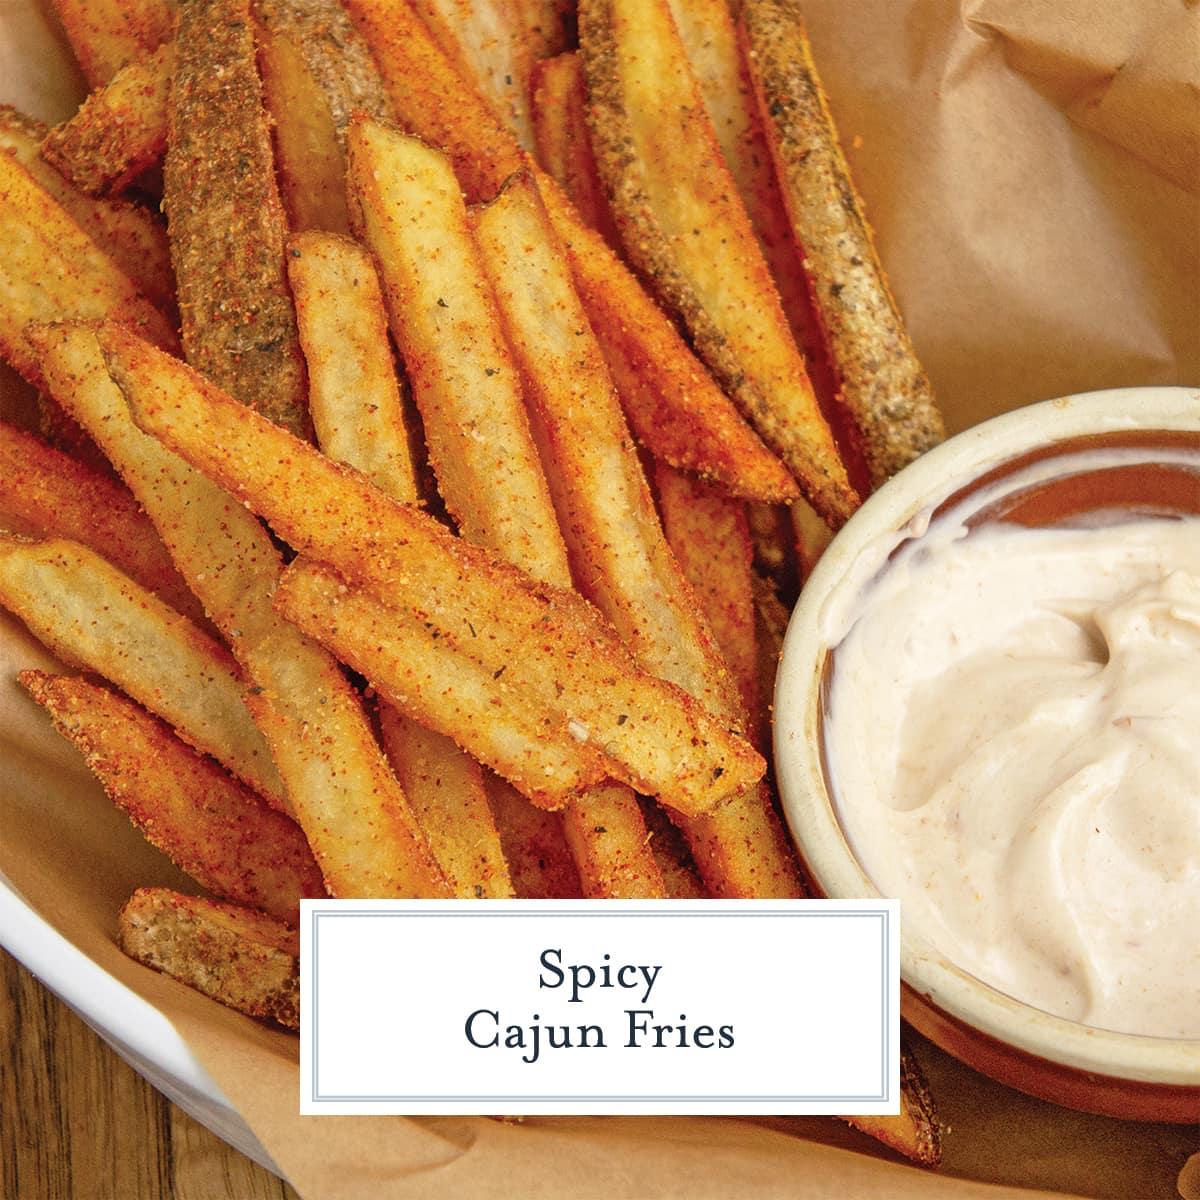 close up of seasoned Cajun fries with dipping sauce